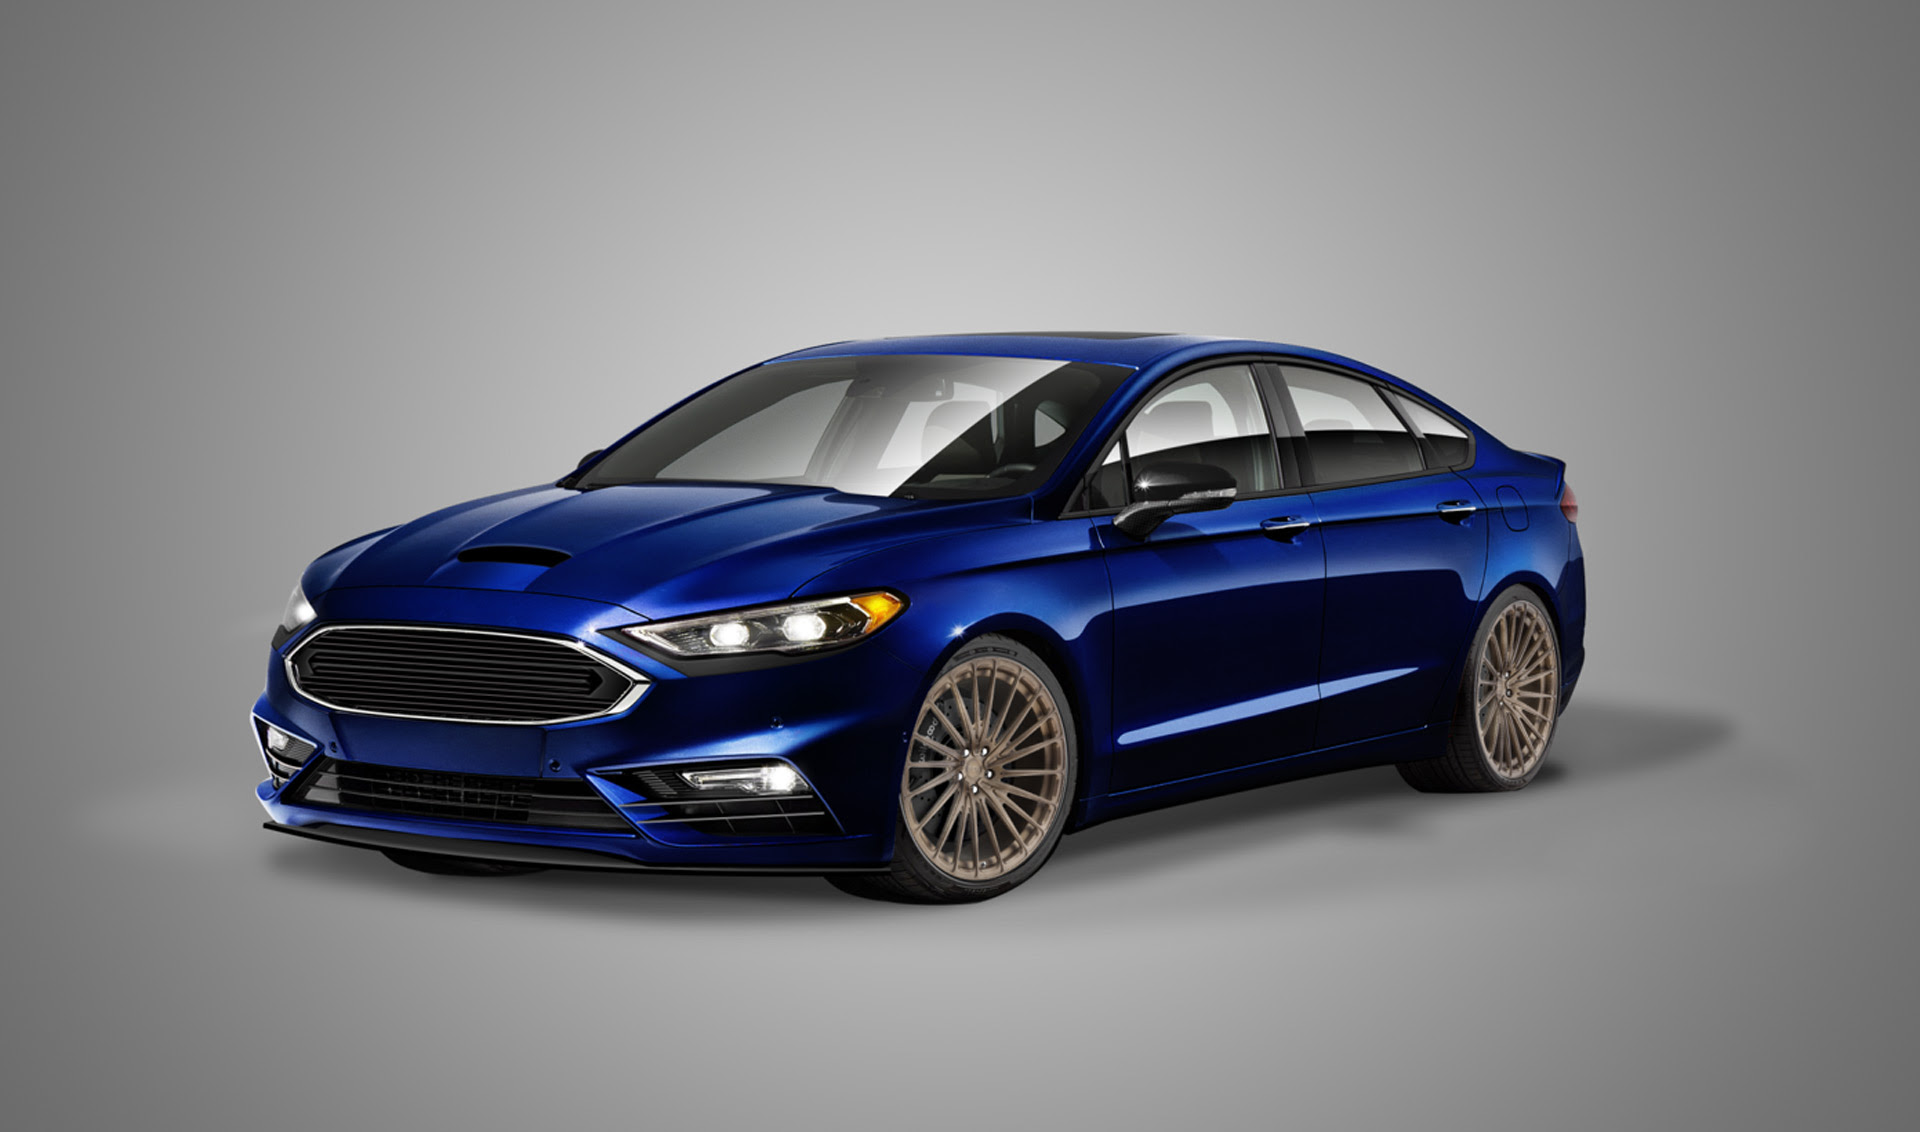 2017 Ford Fusion Sedan Models Specs 12 Bold Models 2017 ...